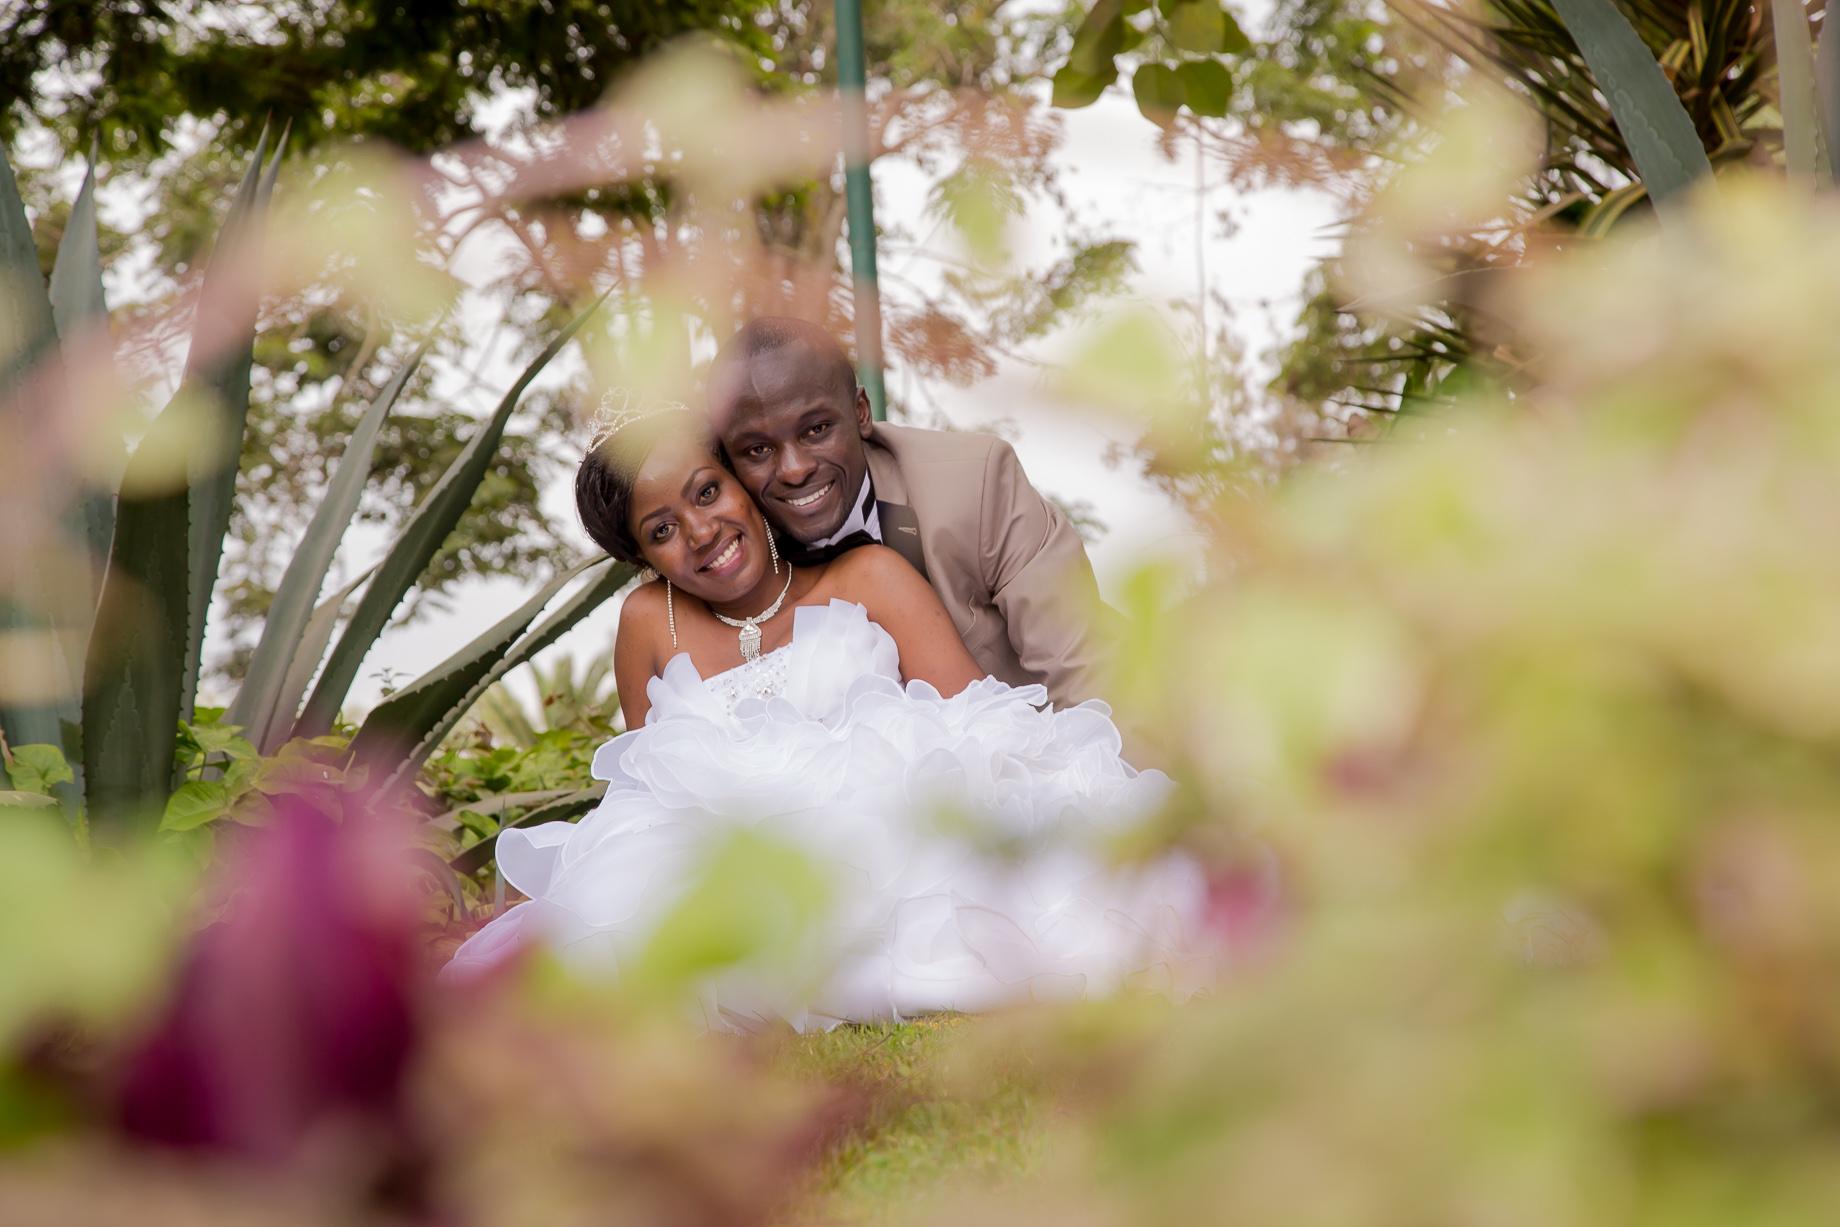 Best wedding photography in Kenya